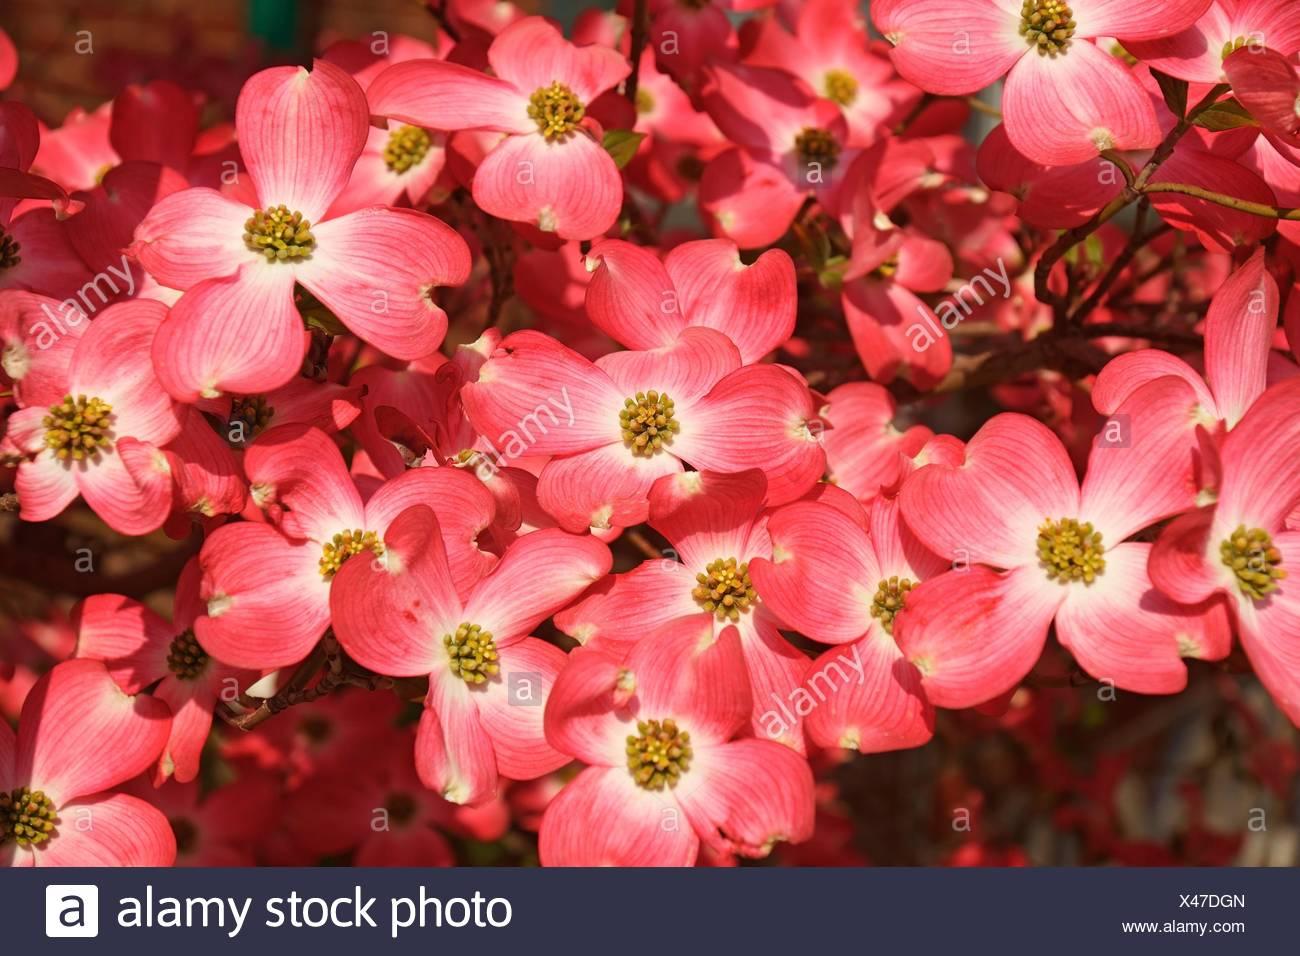 Flowering Dogwood (Cornus florida). Called American Dogwood and Eastern Dogwood also. State tree of North Carolina, West Virginia, Missouri and Stock Photo